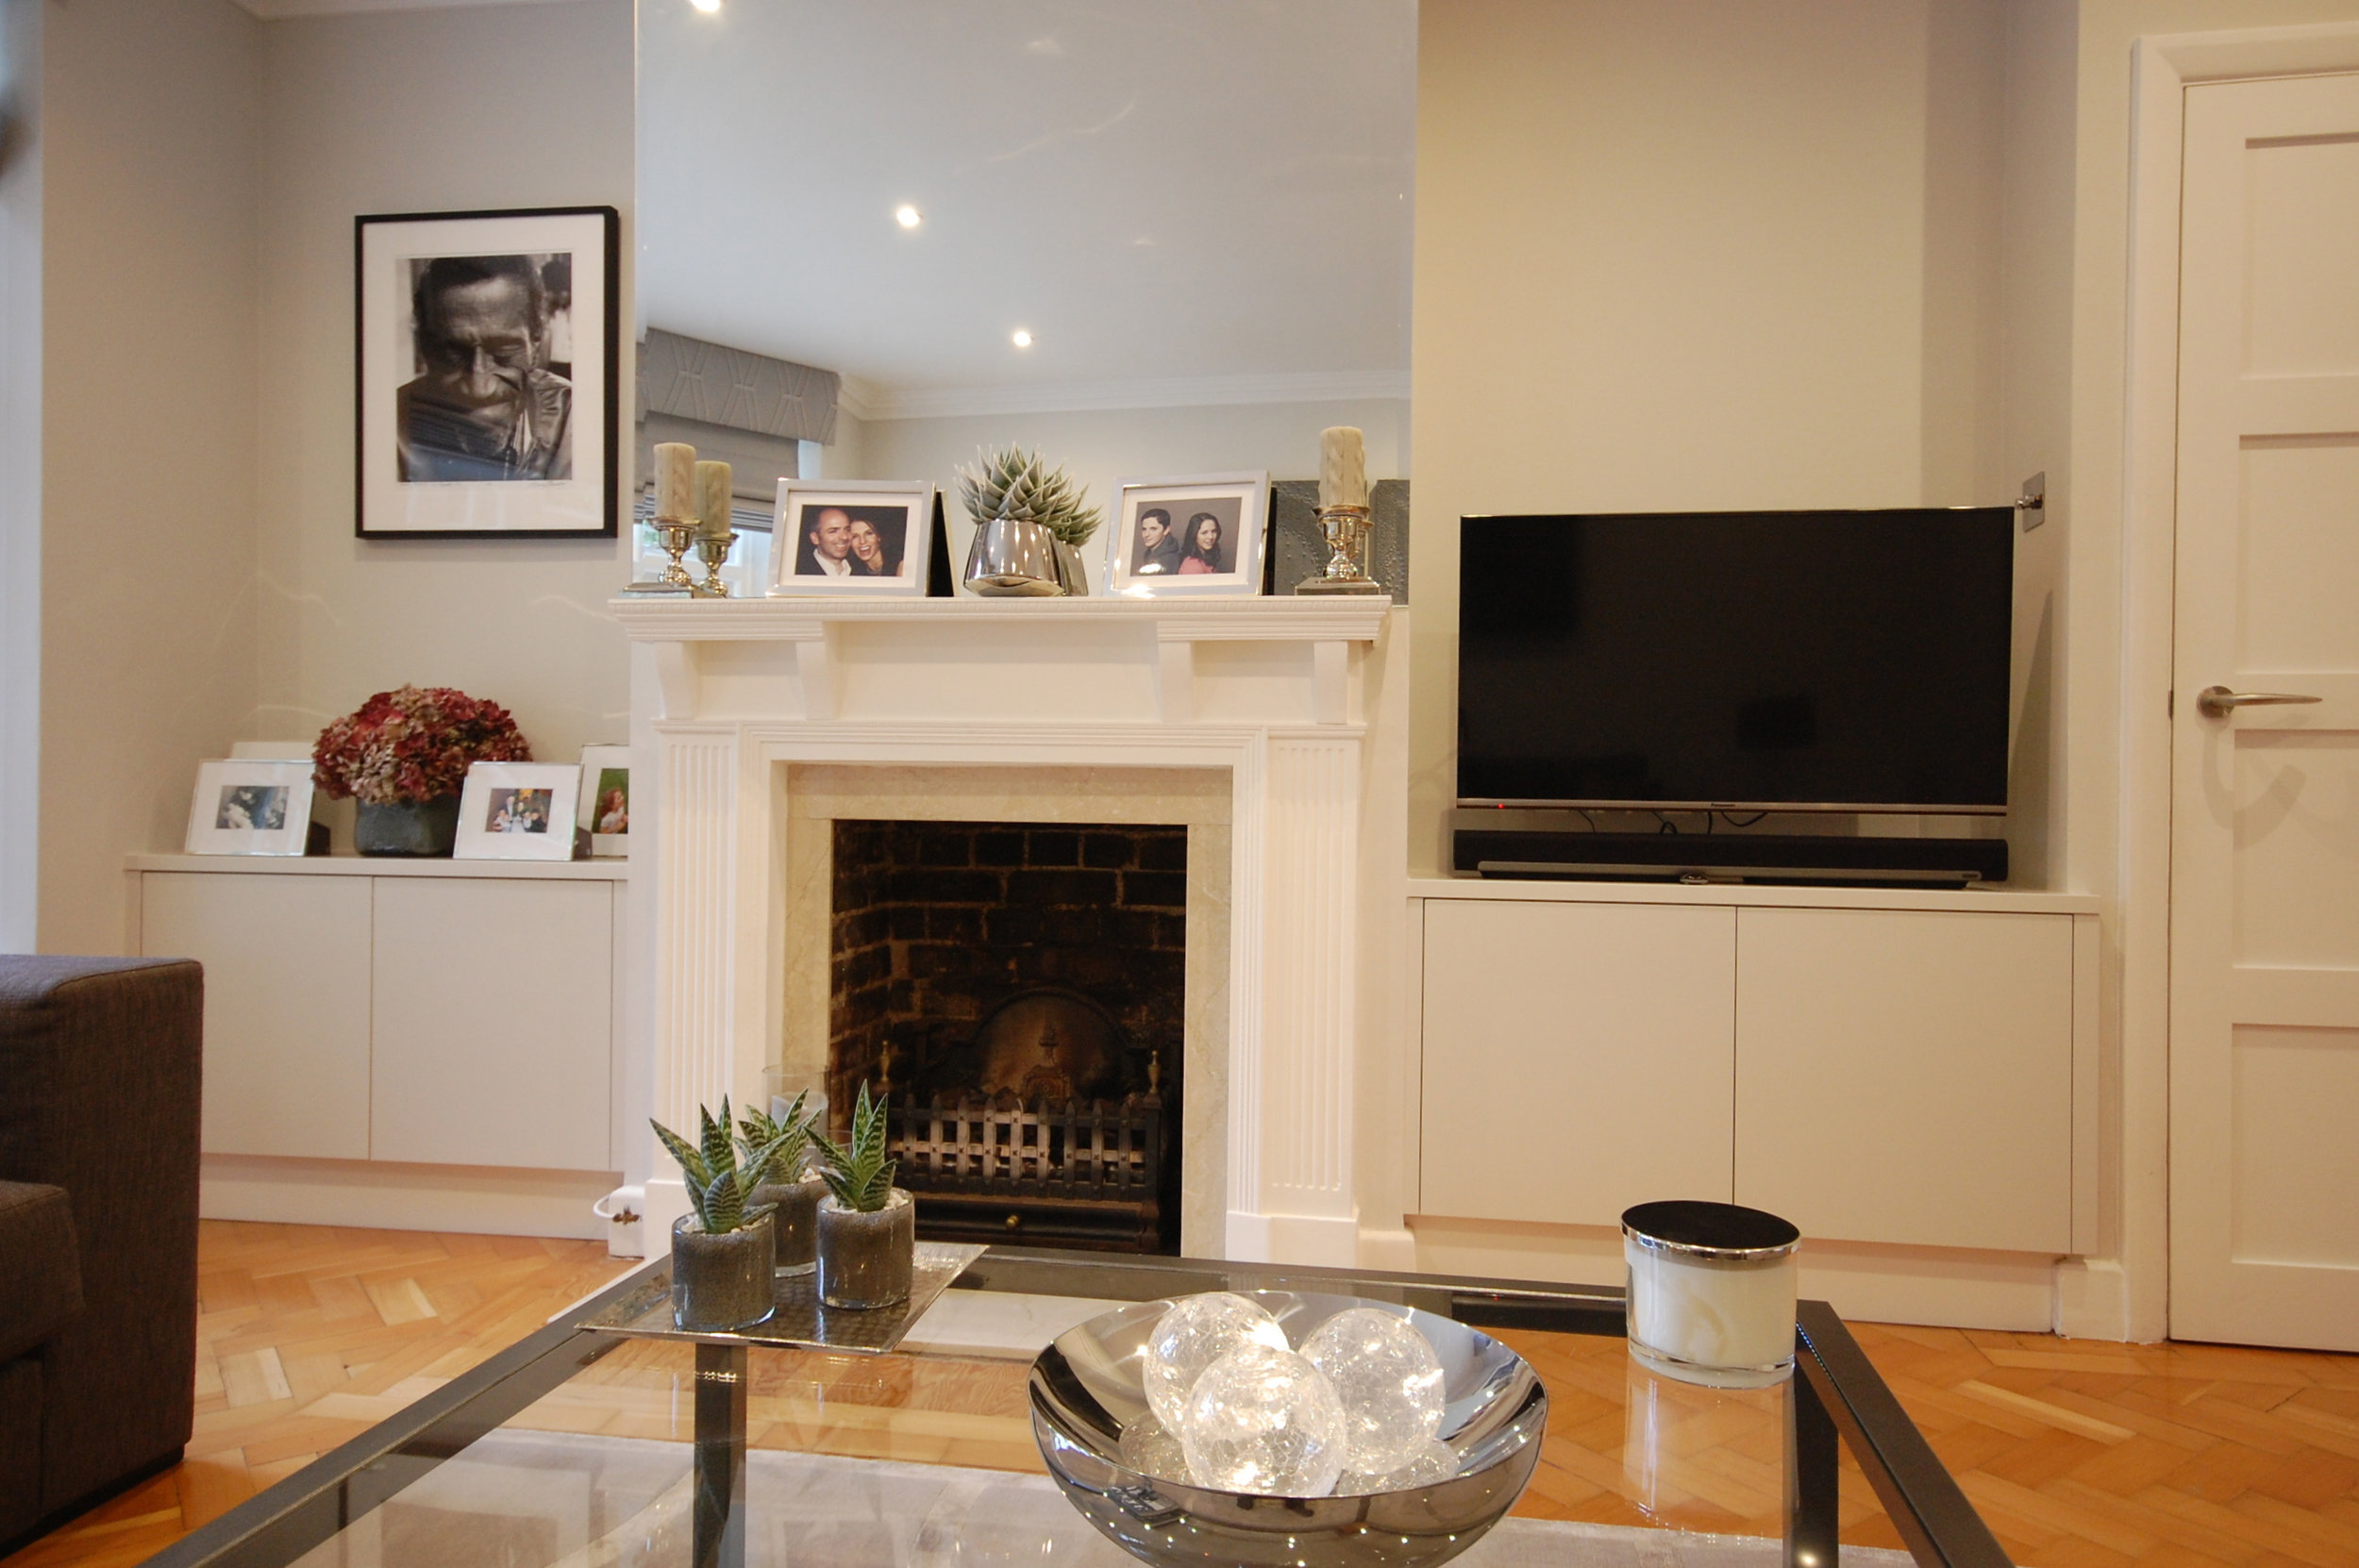 Grain_Bespoke_Furniture_White_Sprayed_Cabinet.jpg